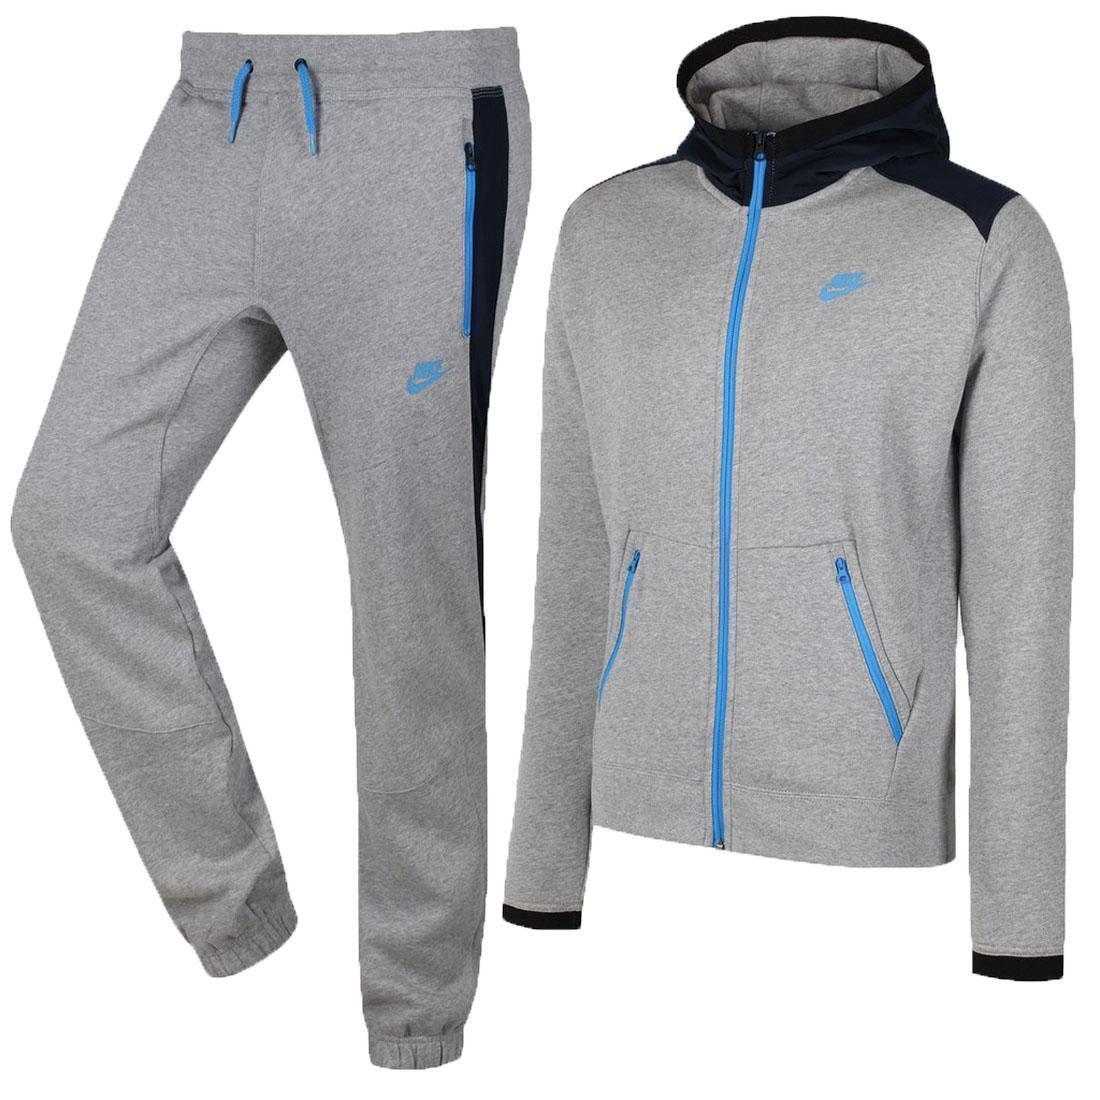 Nike Herren Sportanzug Freizeitanzug Gr. S-M-L-XL NEU!!!